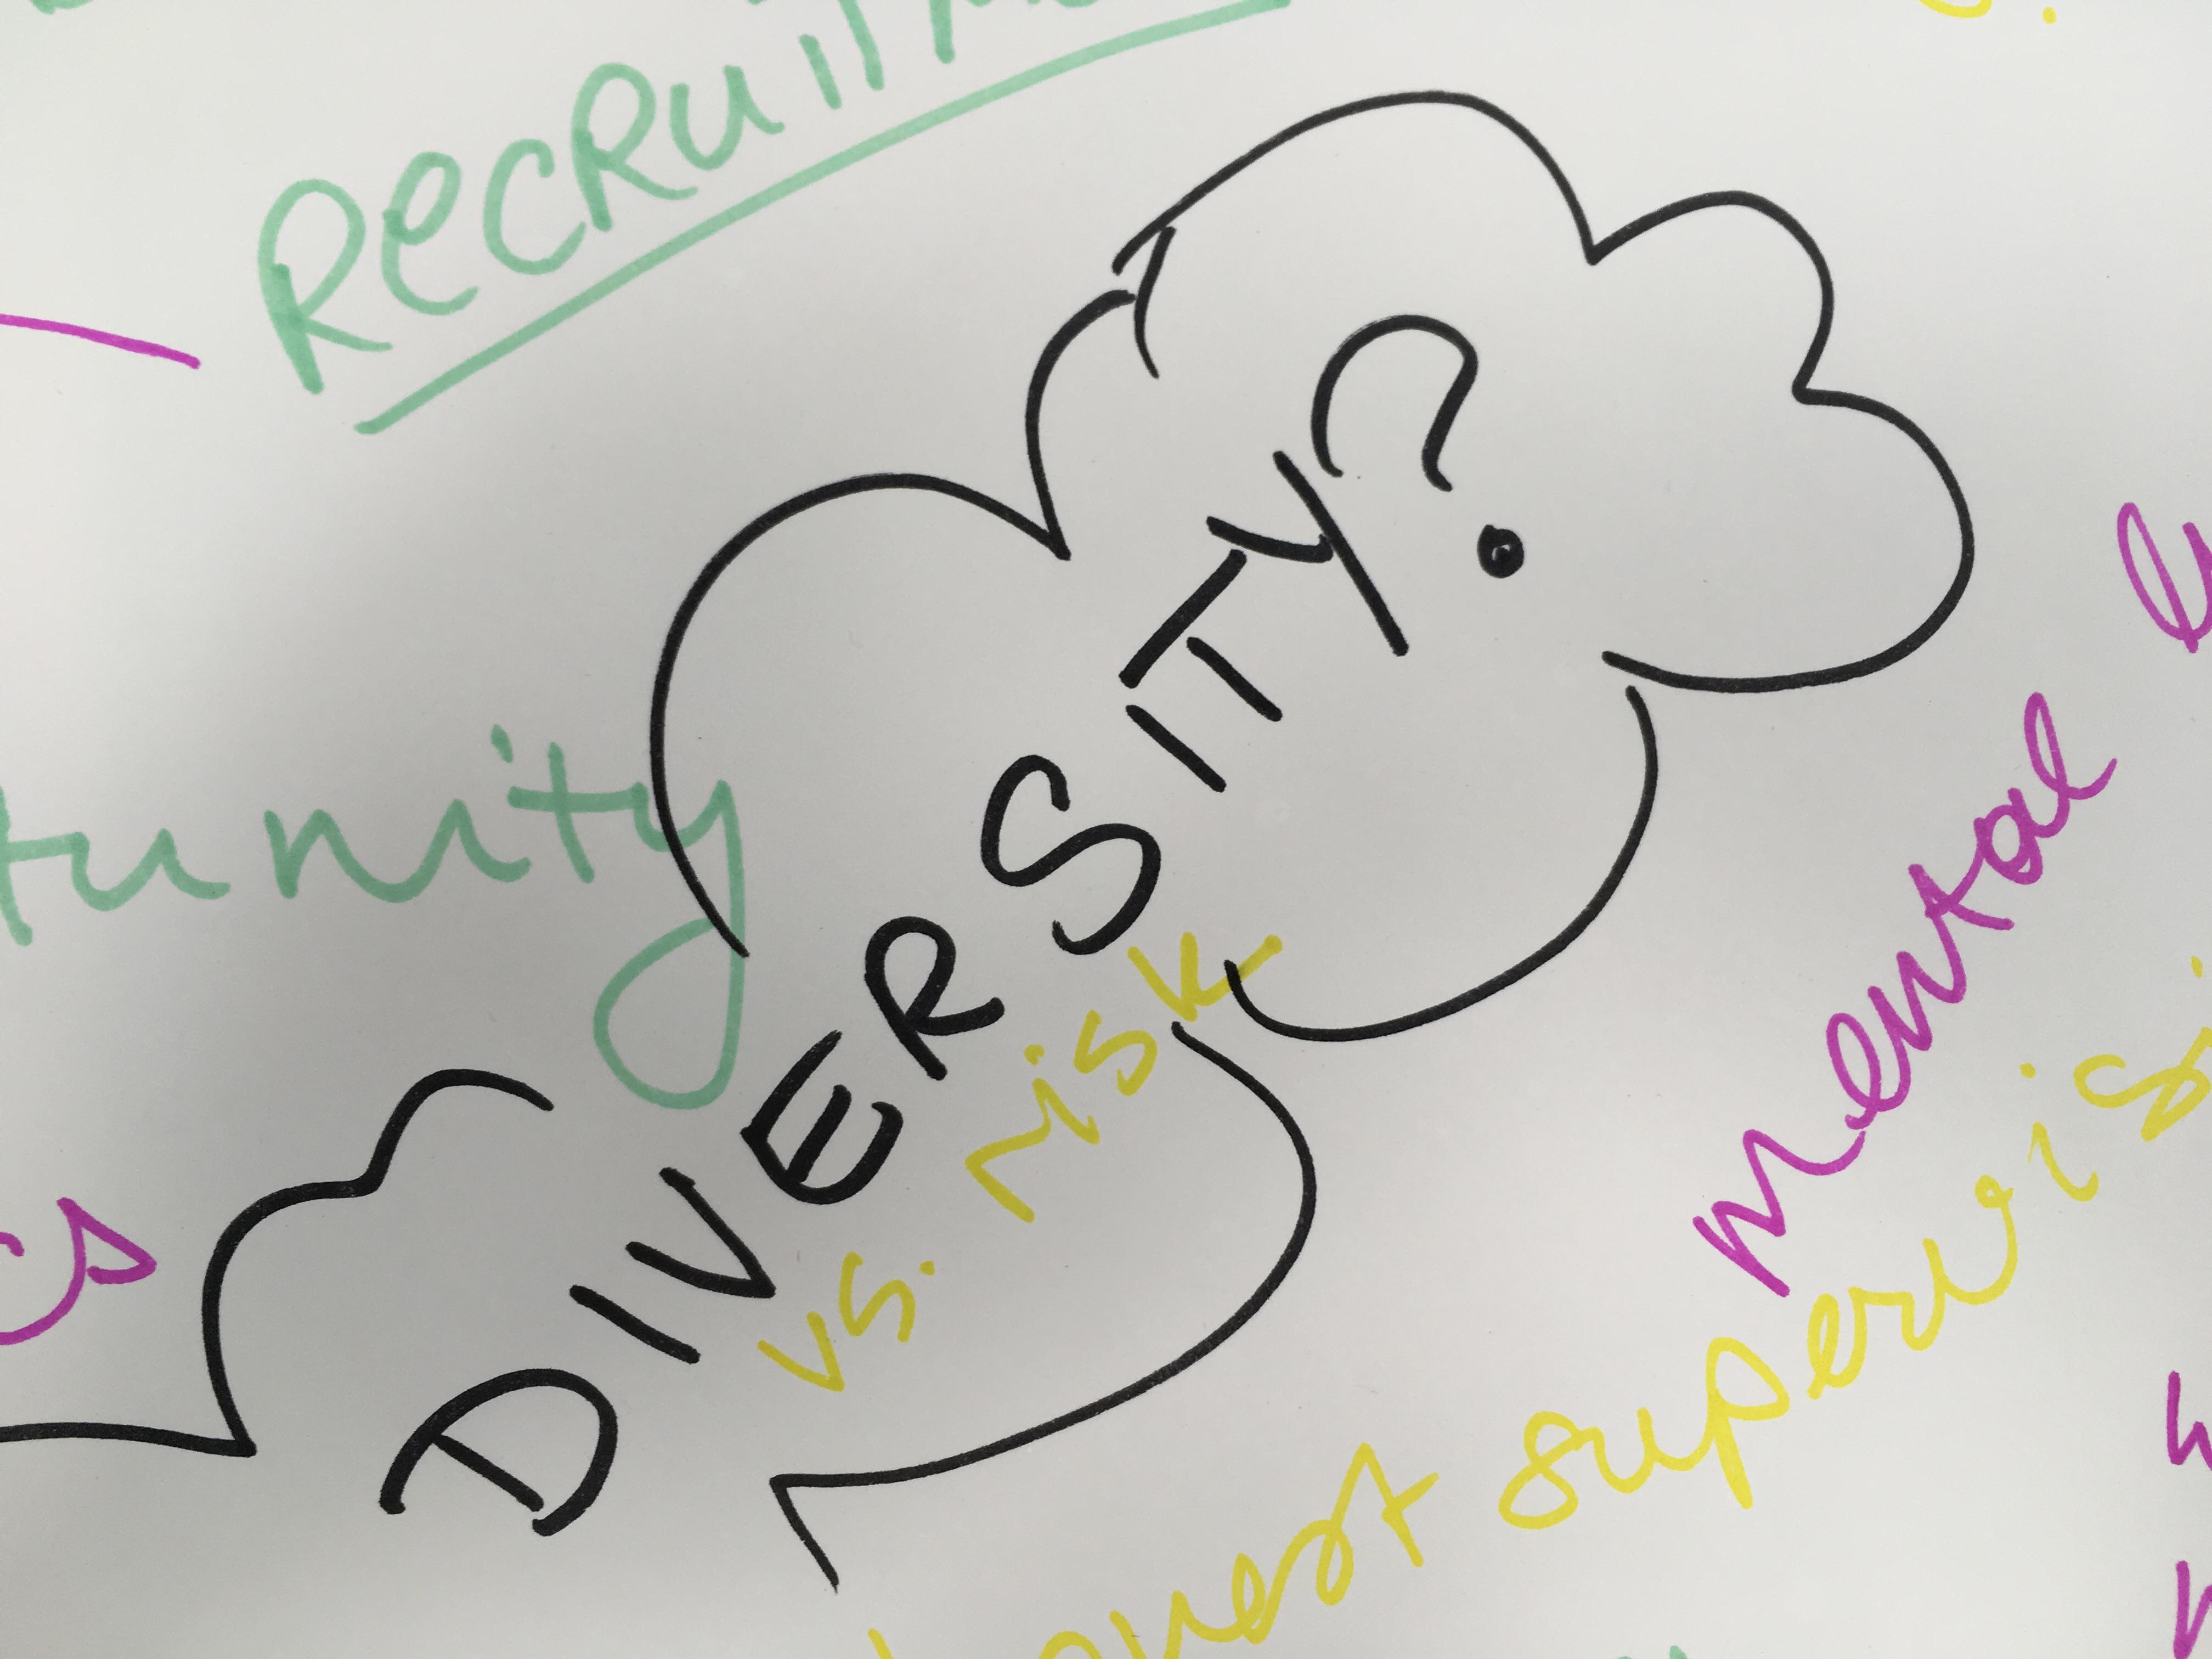 #CHIversity2018: A feminist CHI programme